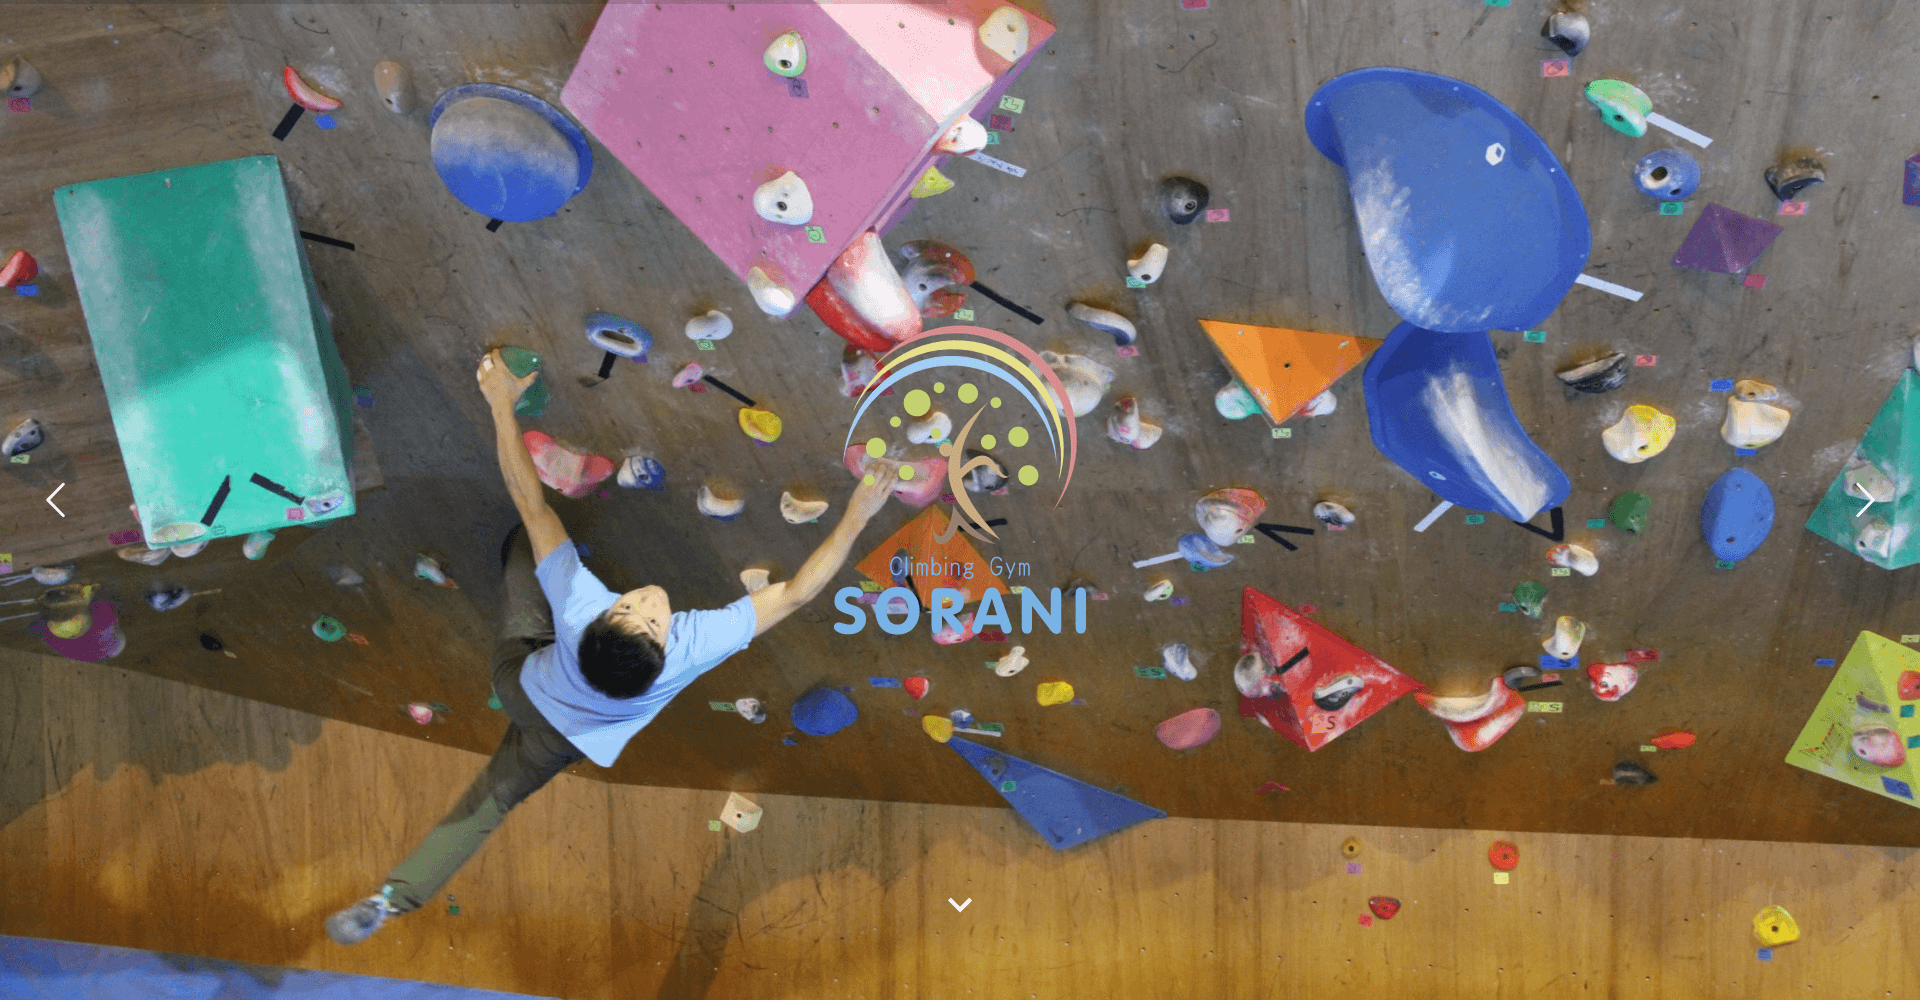 Climbing Gym SORANI